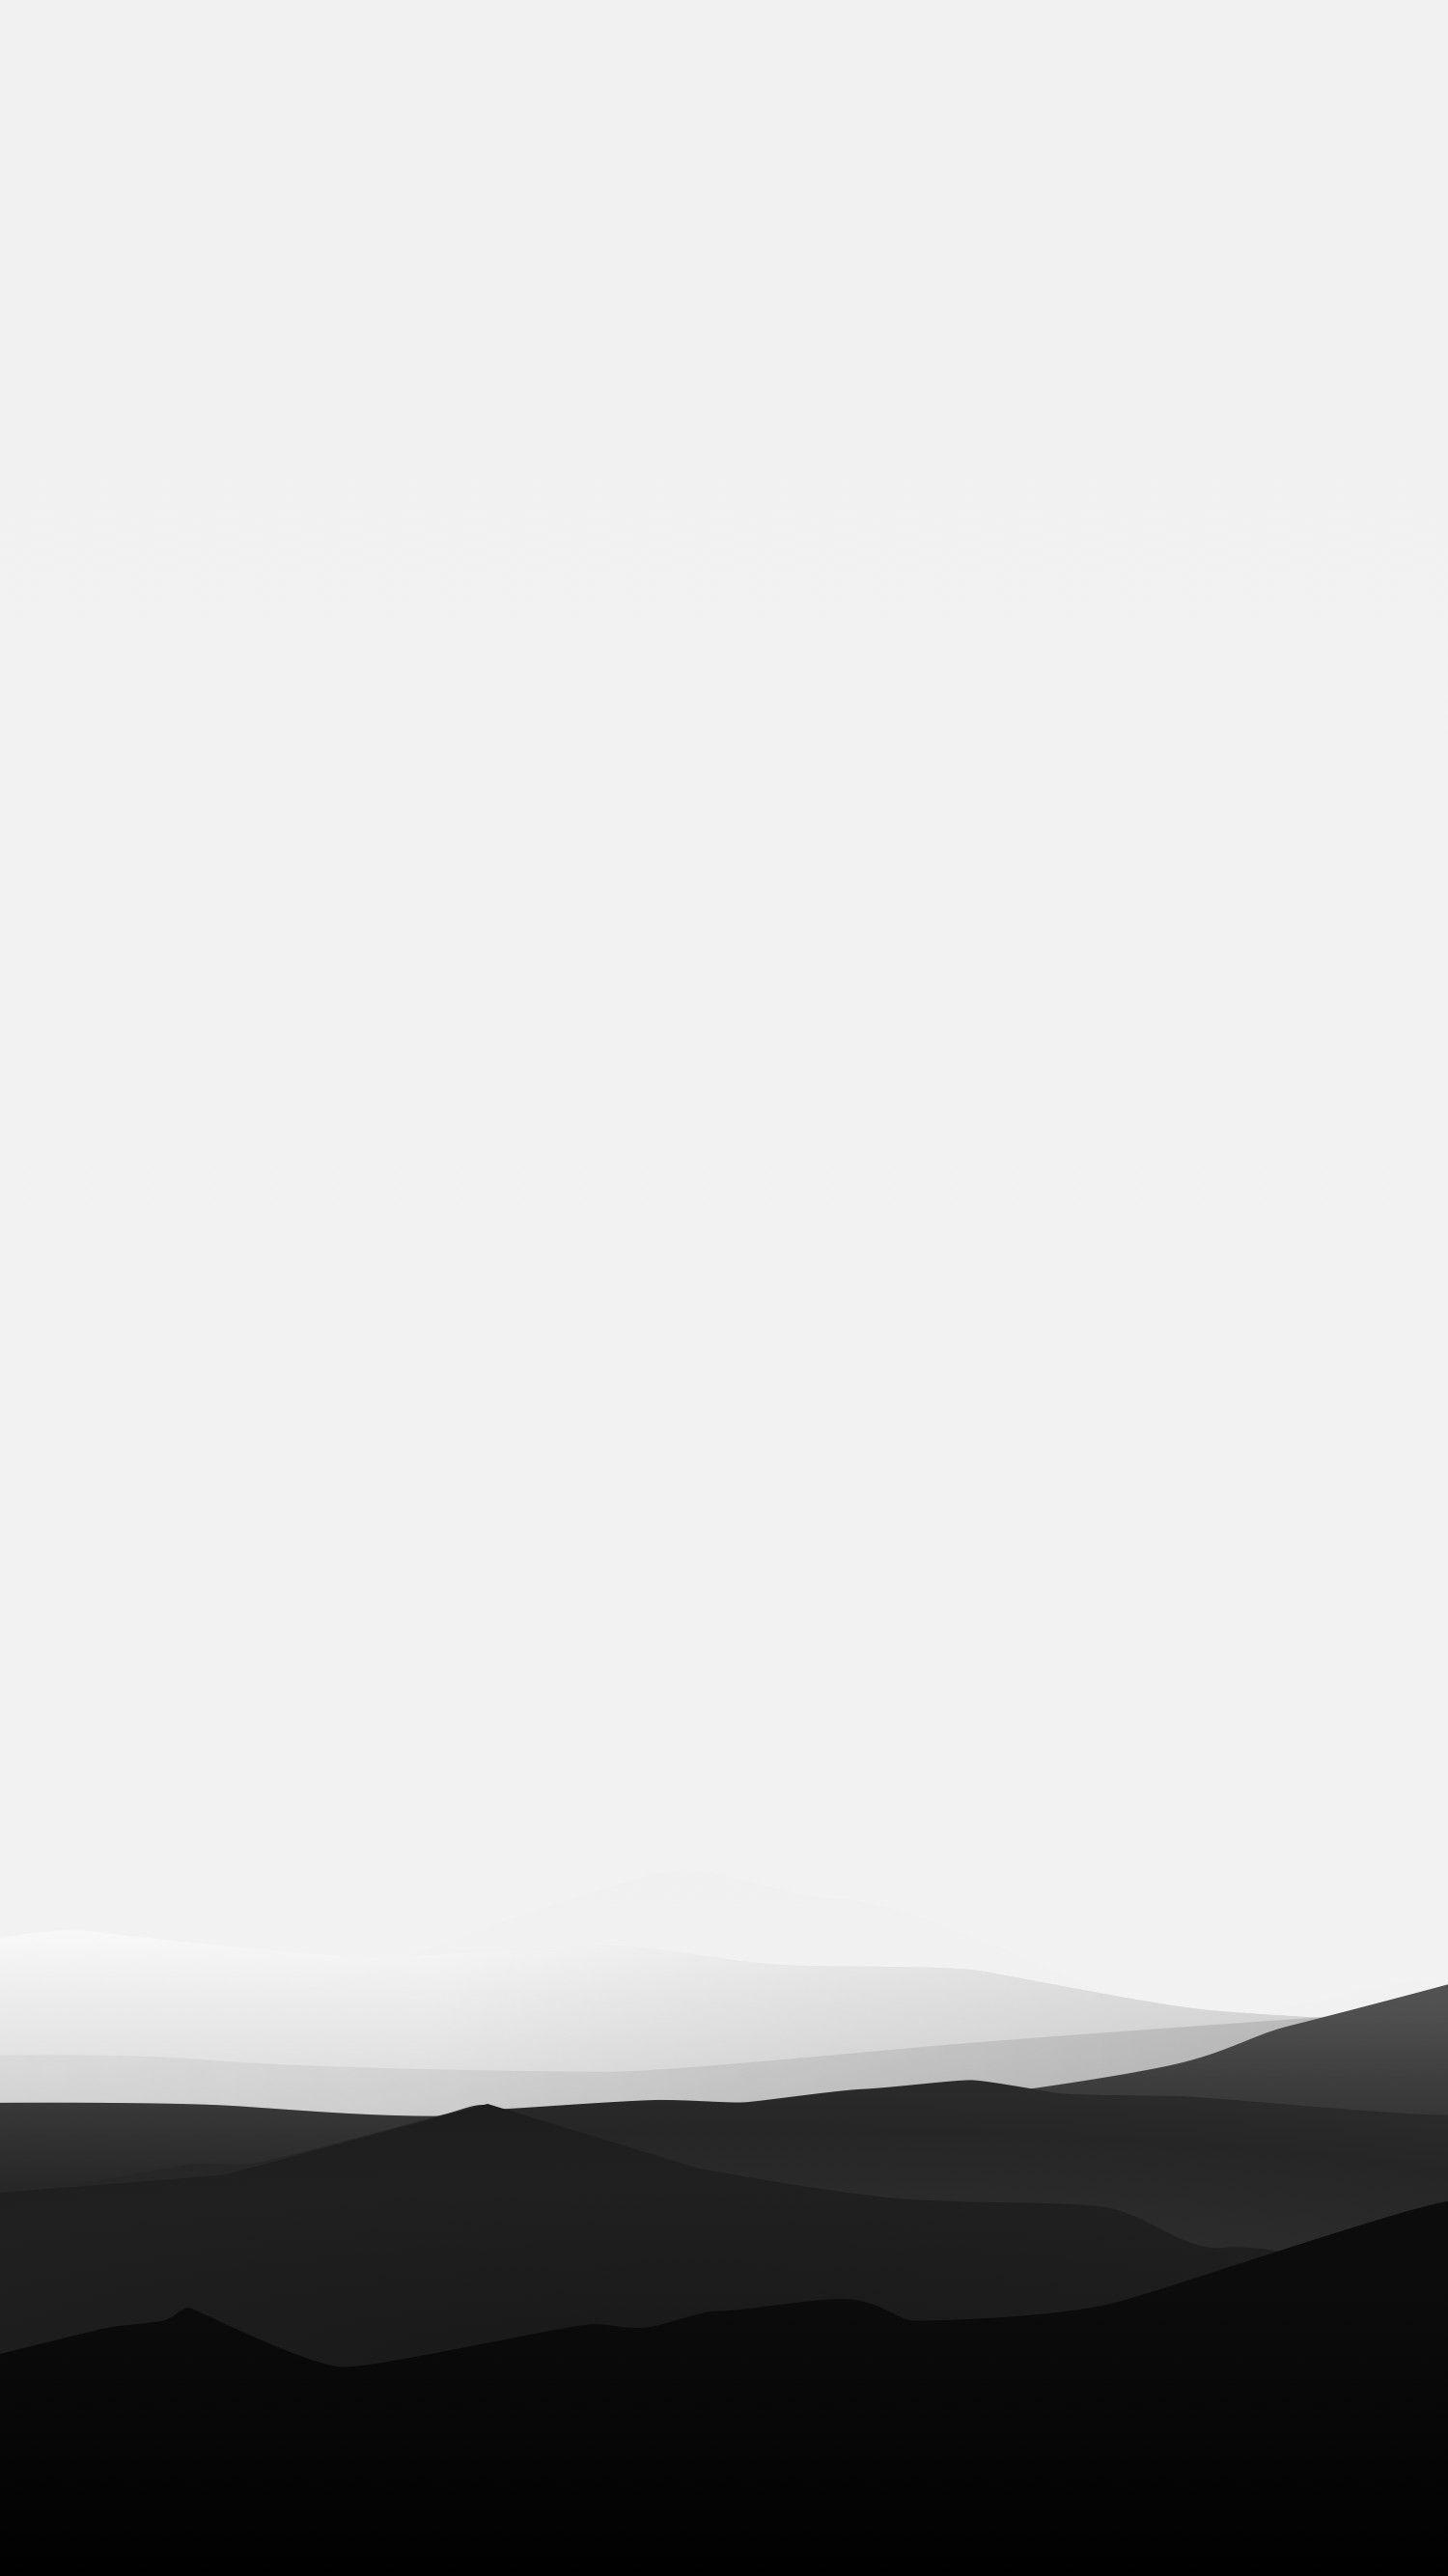 White Minimalist Wallpapers Top Free White Minimalist Backgrounds Wallpaperacc Iphone Minimalist Wallpaper Iphone Wallpaper Minimal White Iphone Background